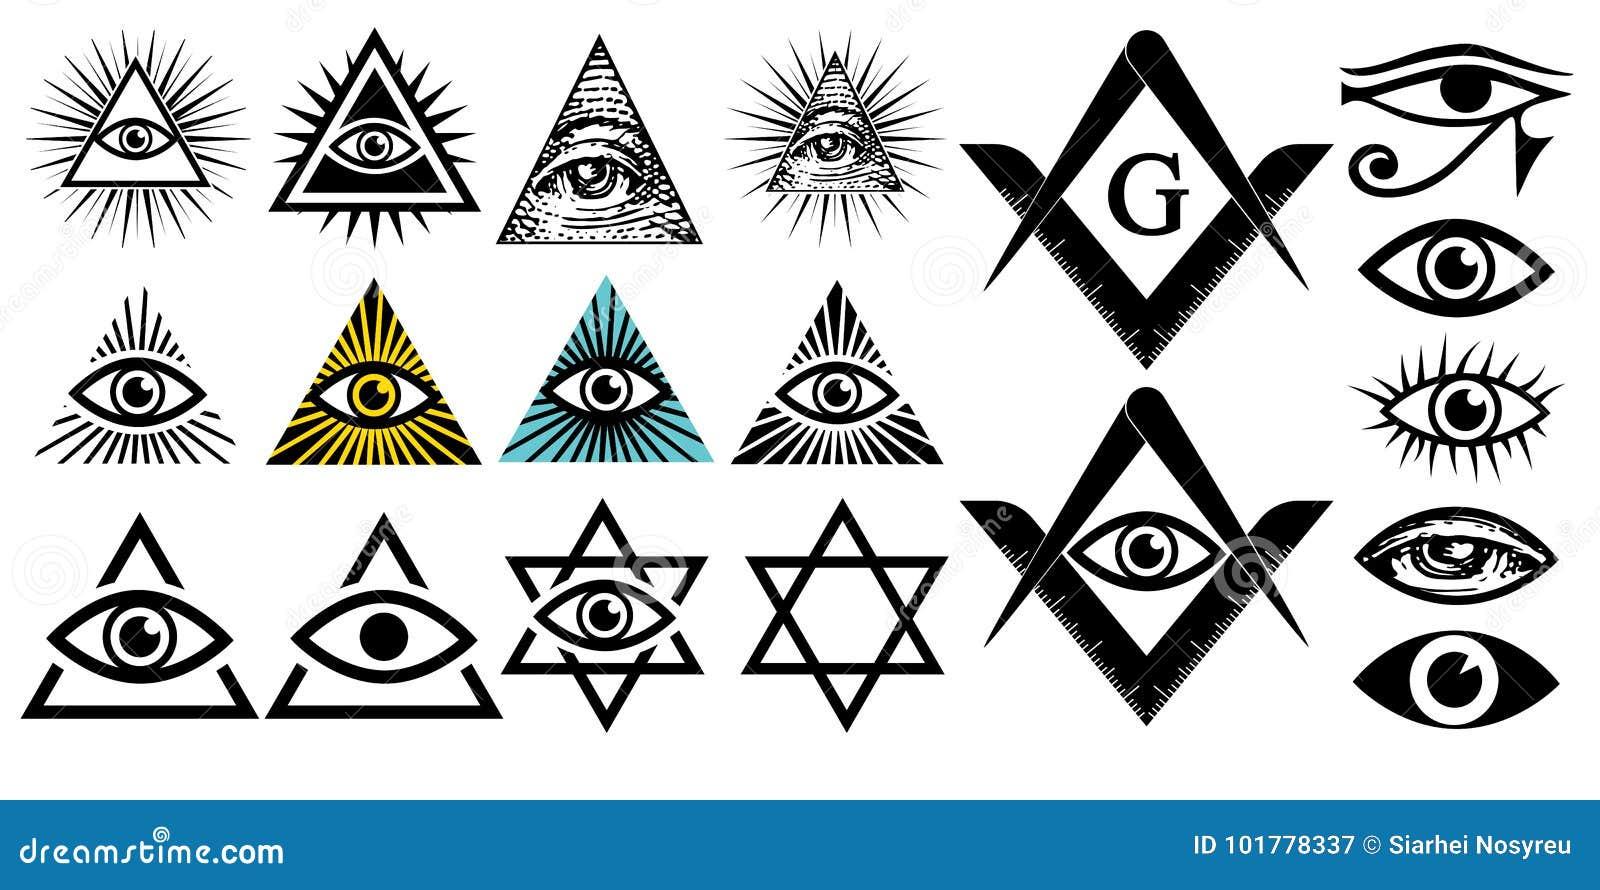 All Seeing Eye Illuminati Symbols Masonic Sign Conspiracy Of